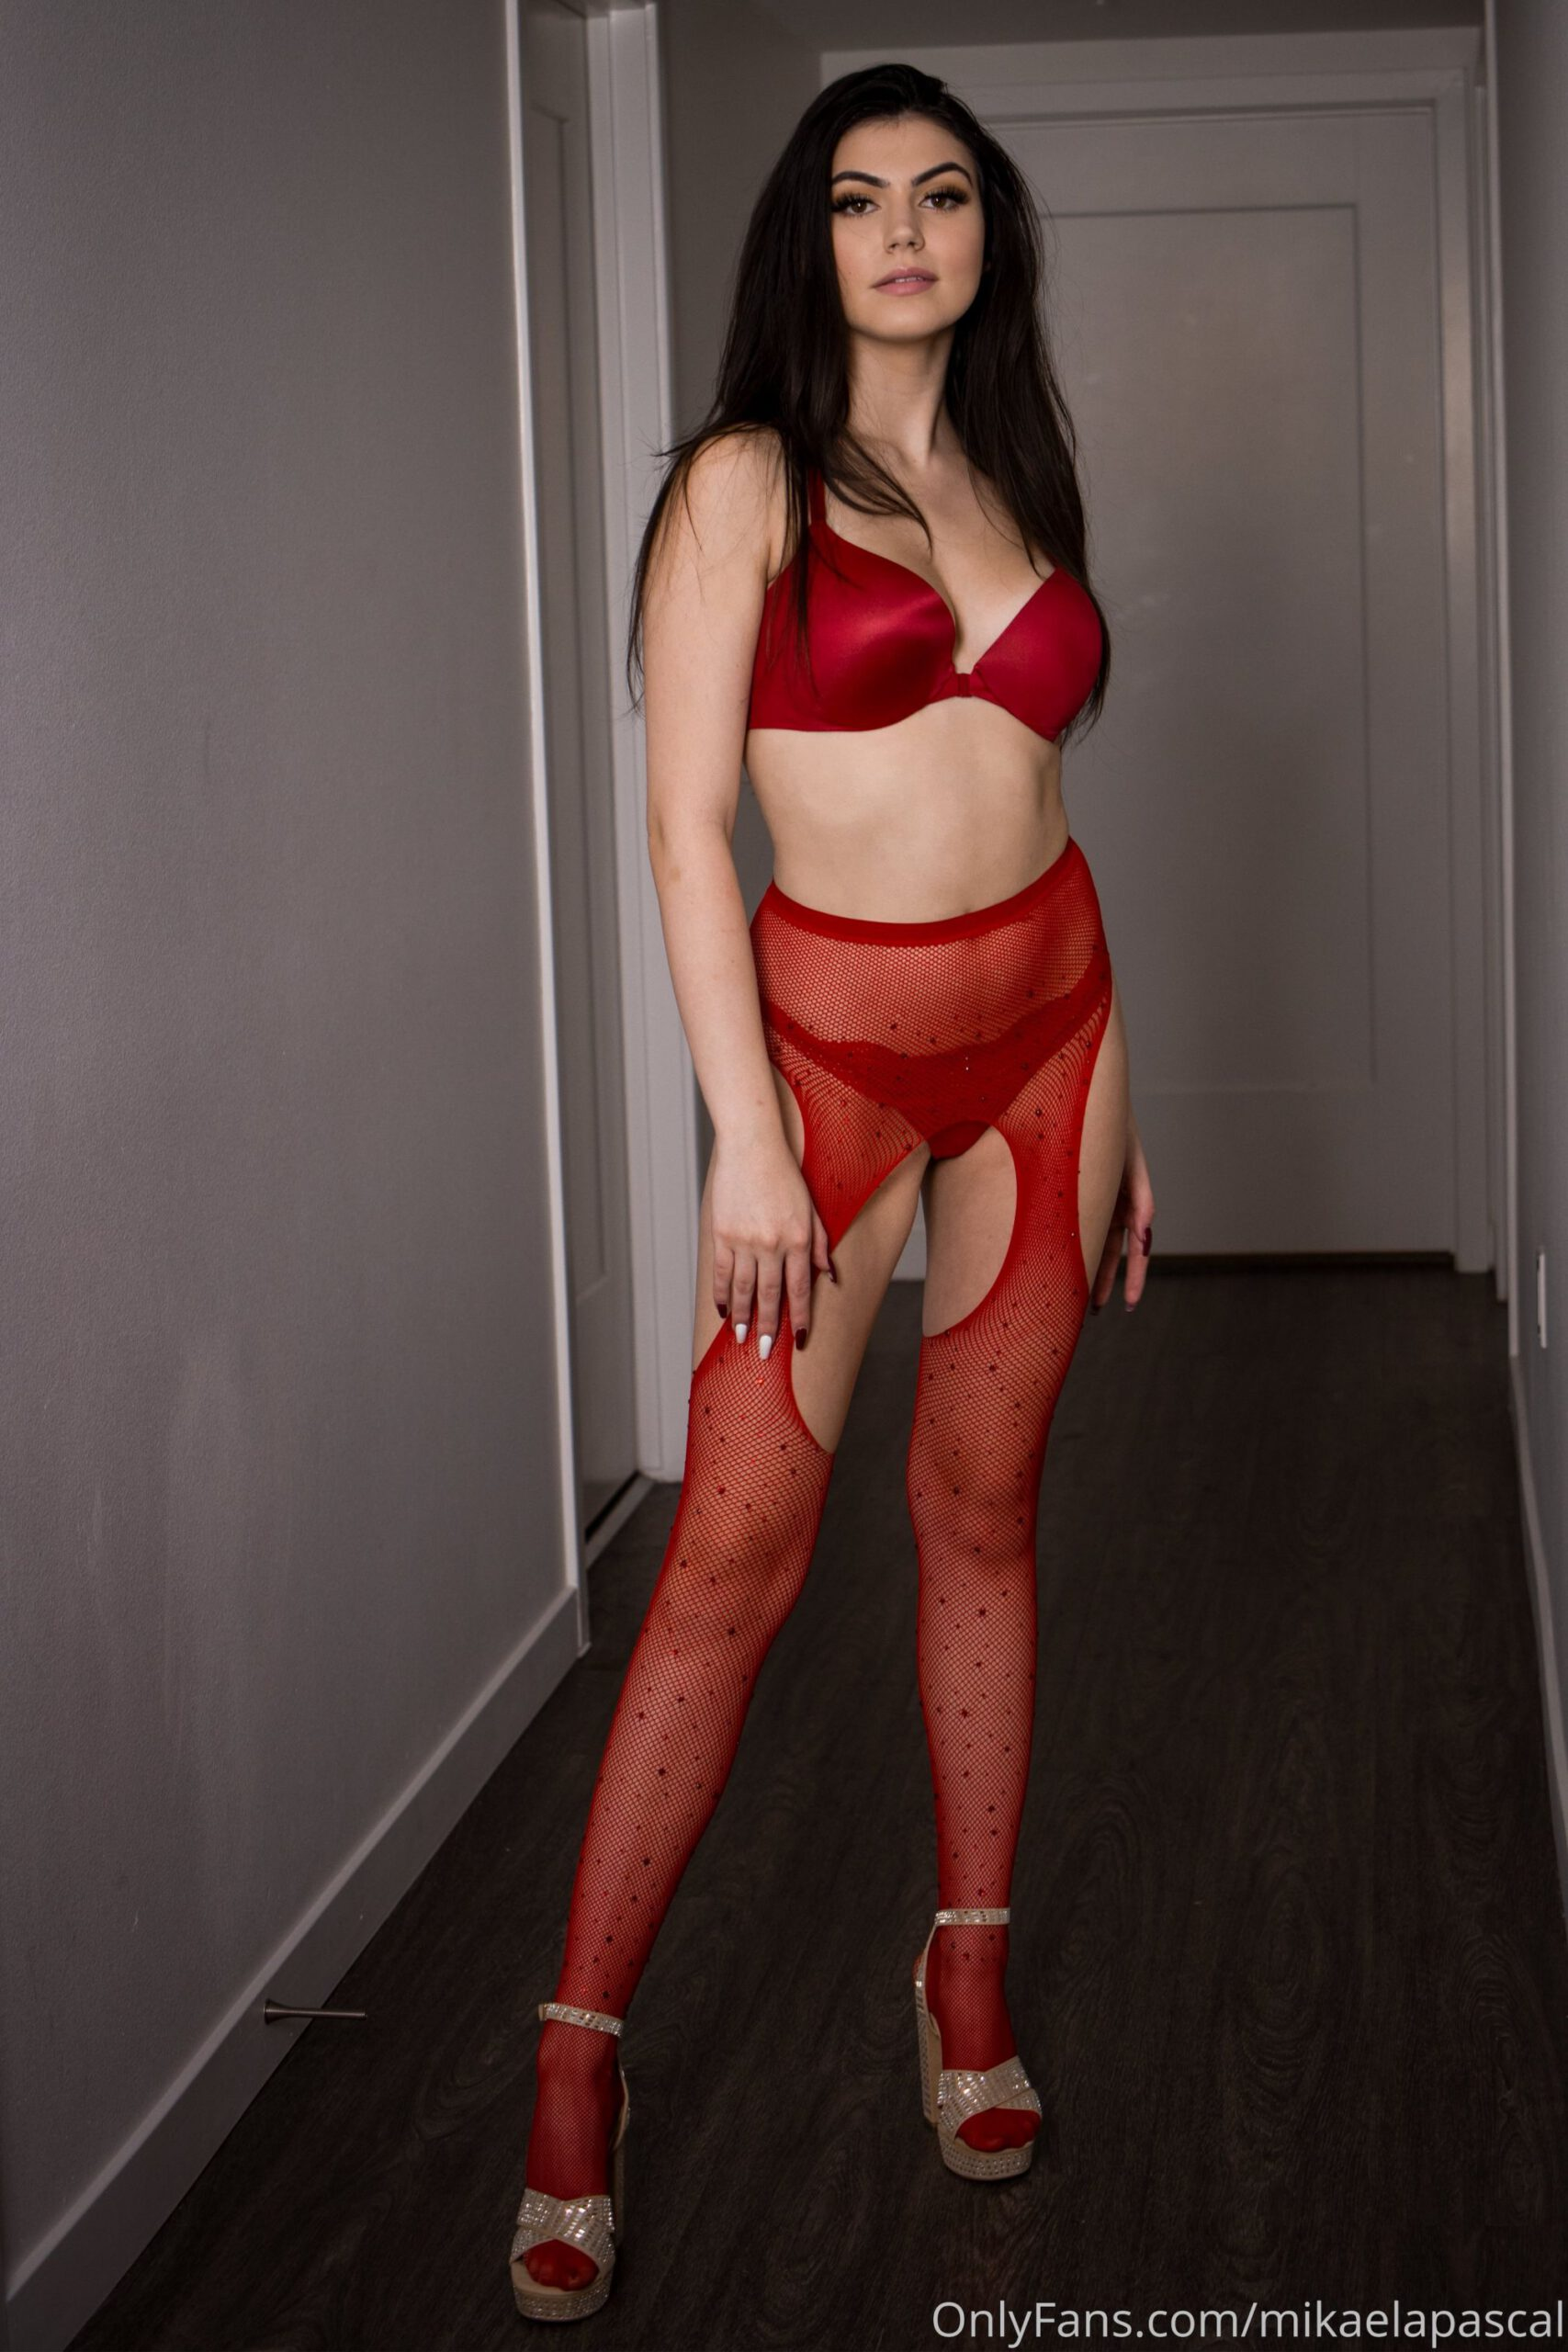 Mikaela Pascal Red Lingerie 0002